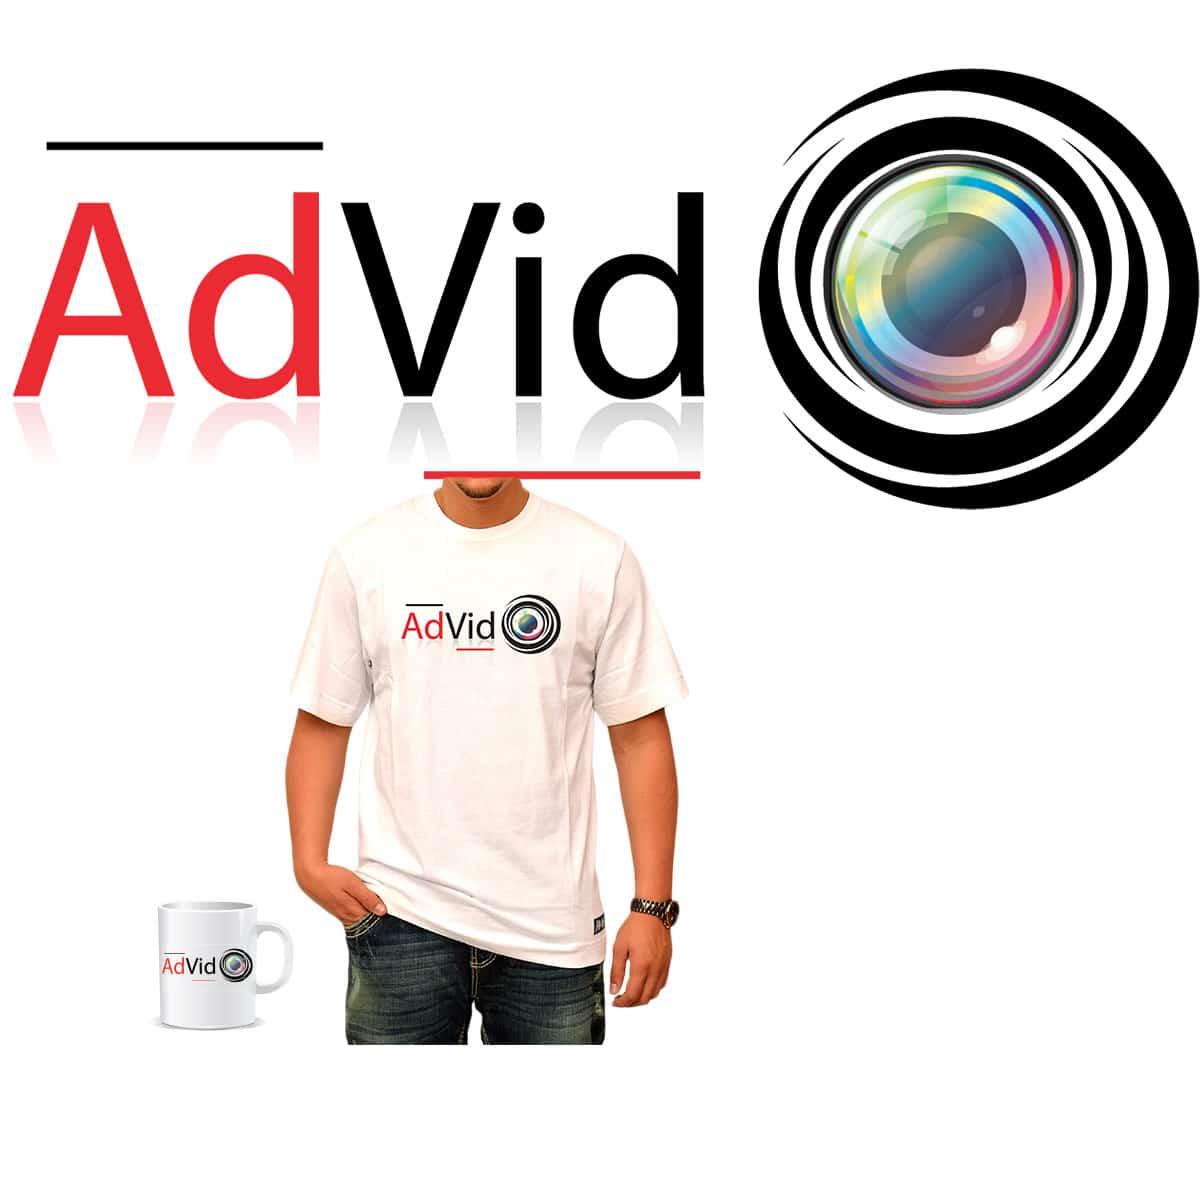 Advid